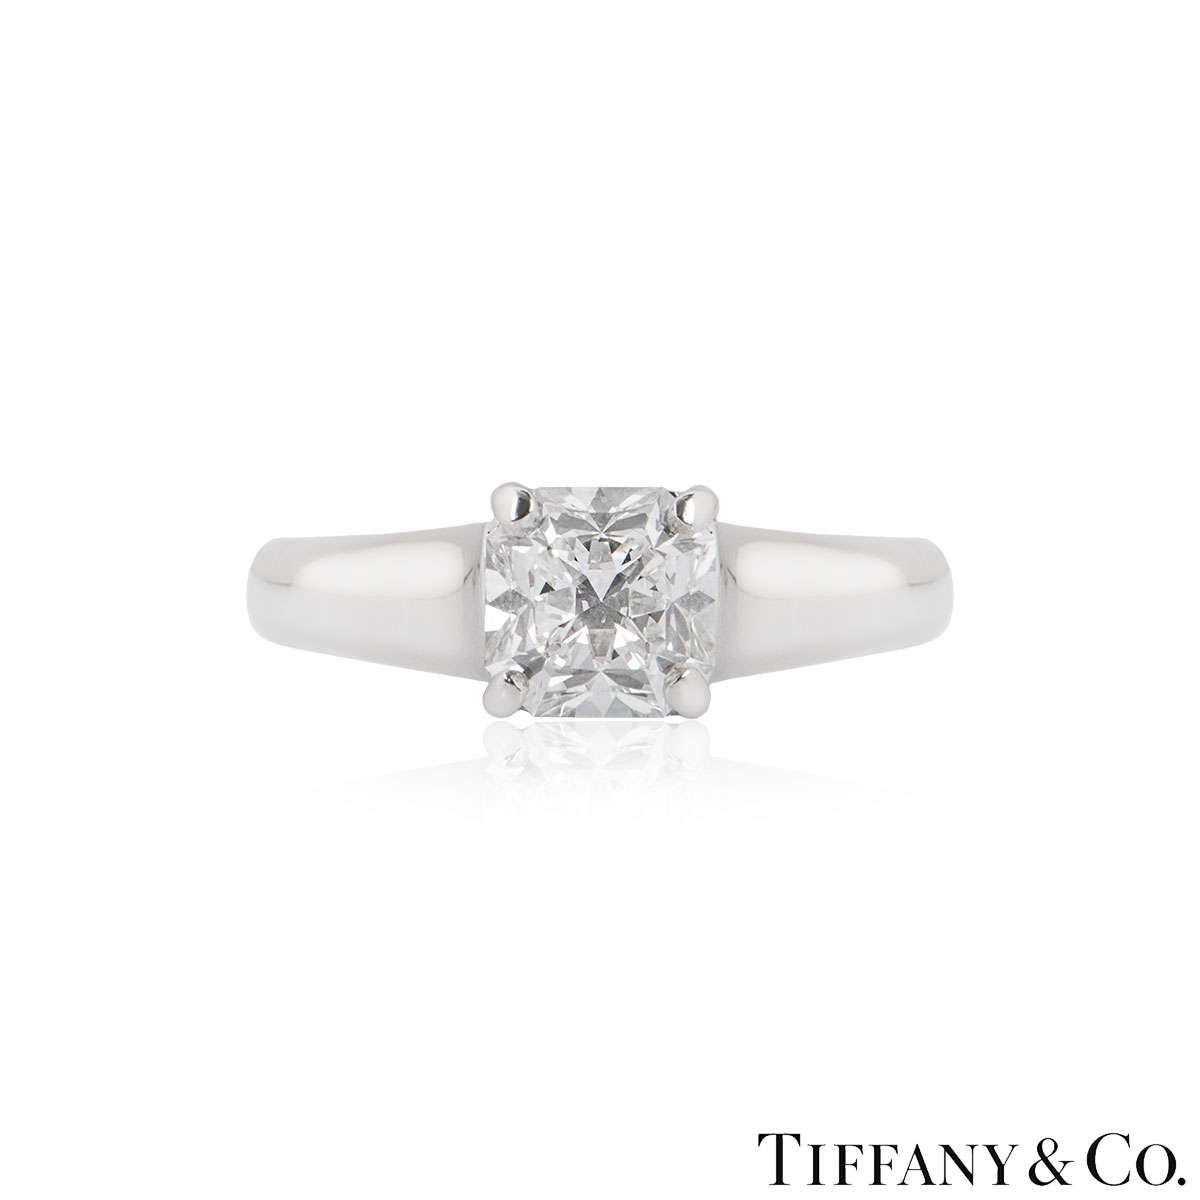 Tiffany & Co. Lucida Cut Diamond Ring 1.52ct G/VVS1